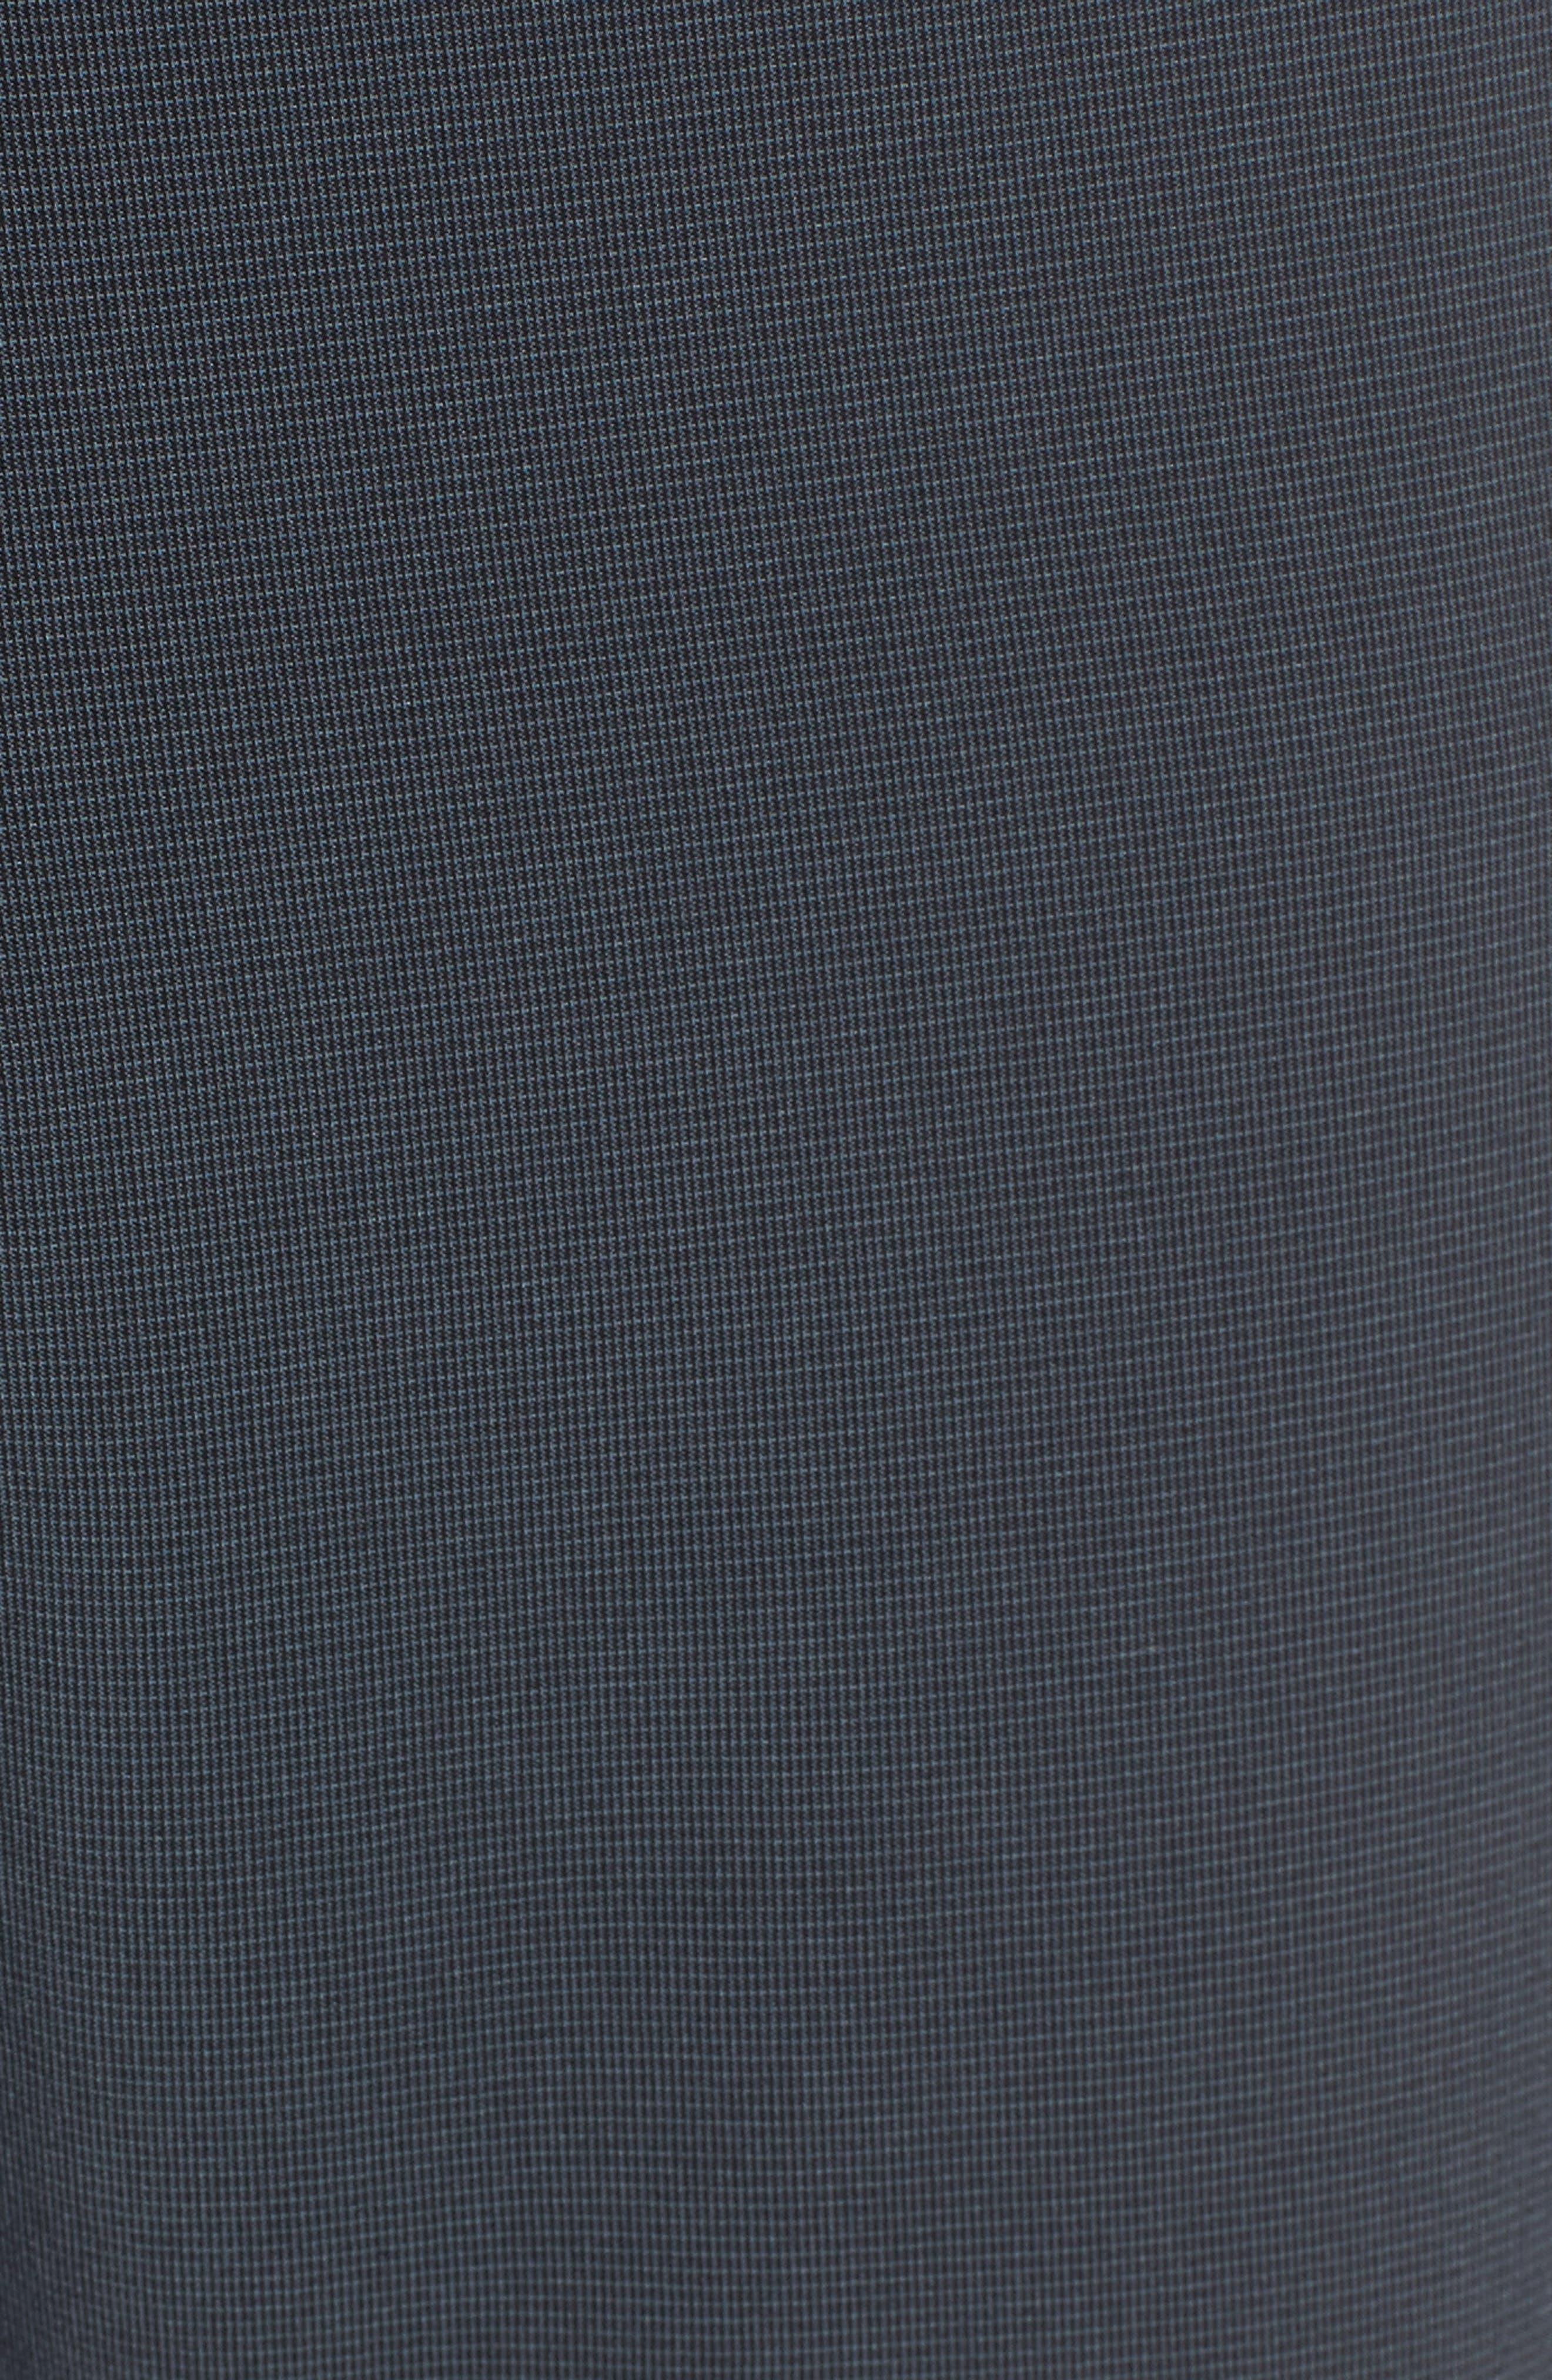 Grid Hybrid Shorts,                             Alternate thumbnail 5, color,                             001